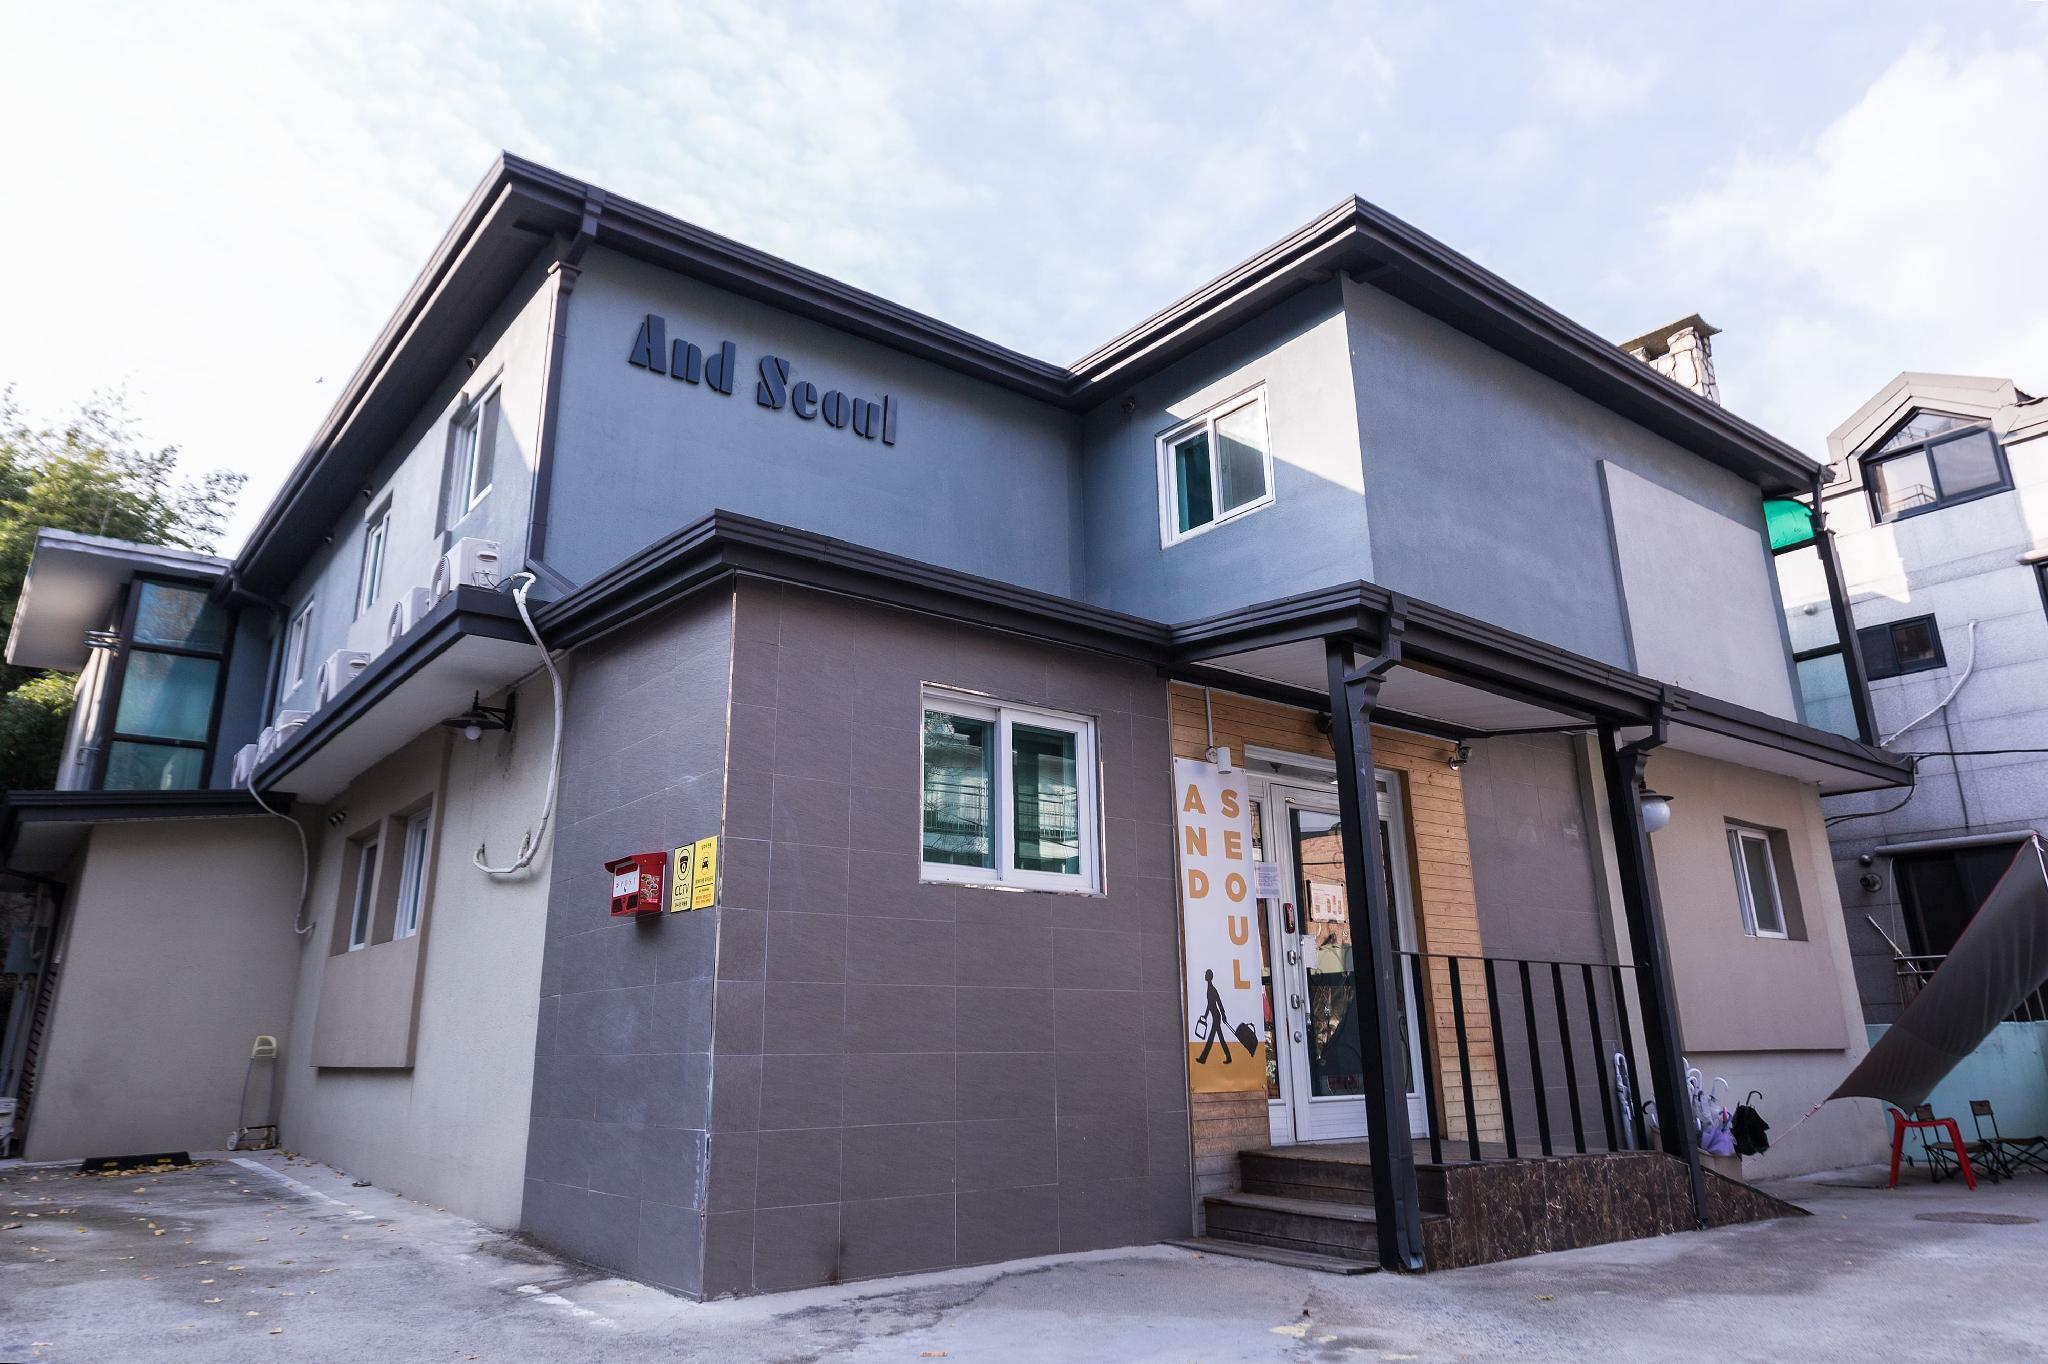 And Seoul Hostel